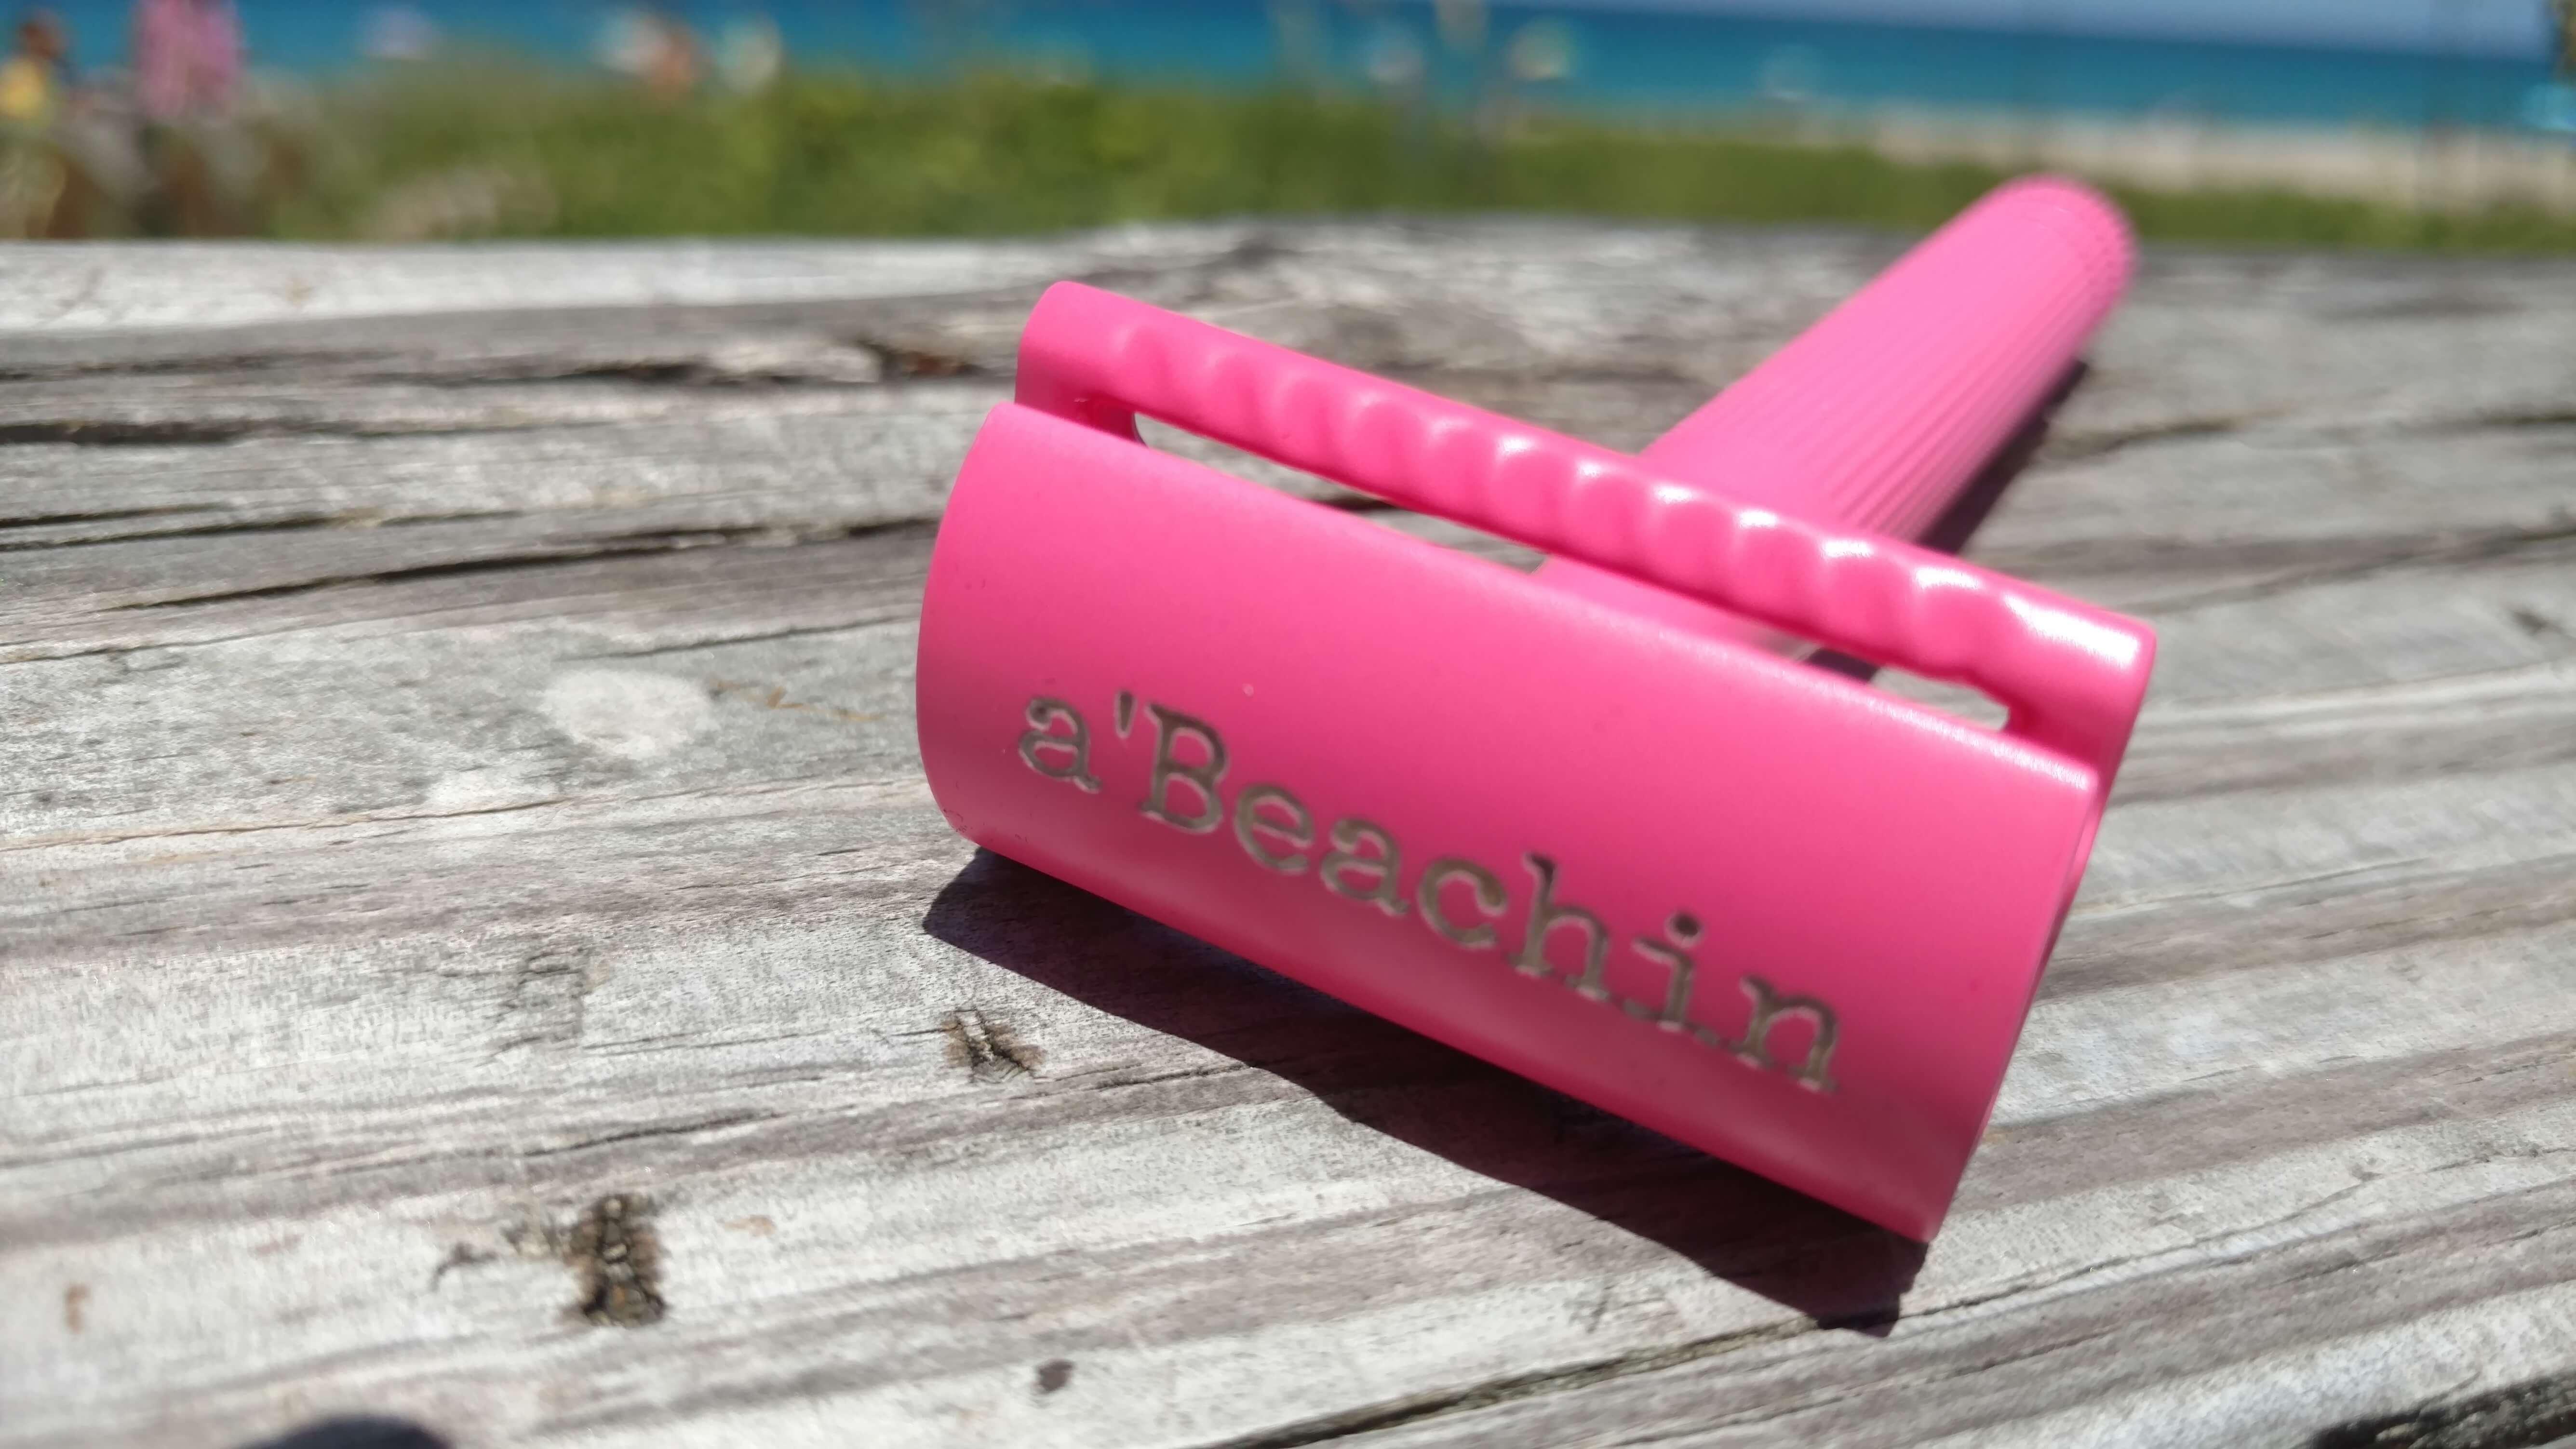 a'Beachin Lit'l Detox box - Soap, Deodorant, and more FREE Razor & Blades